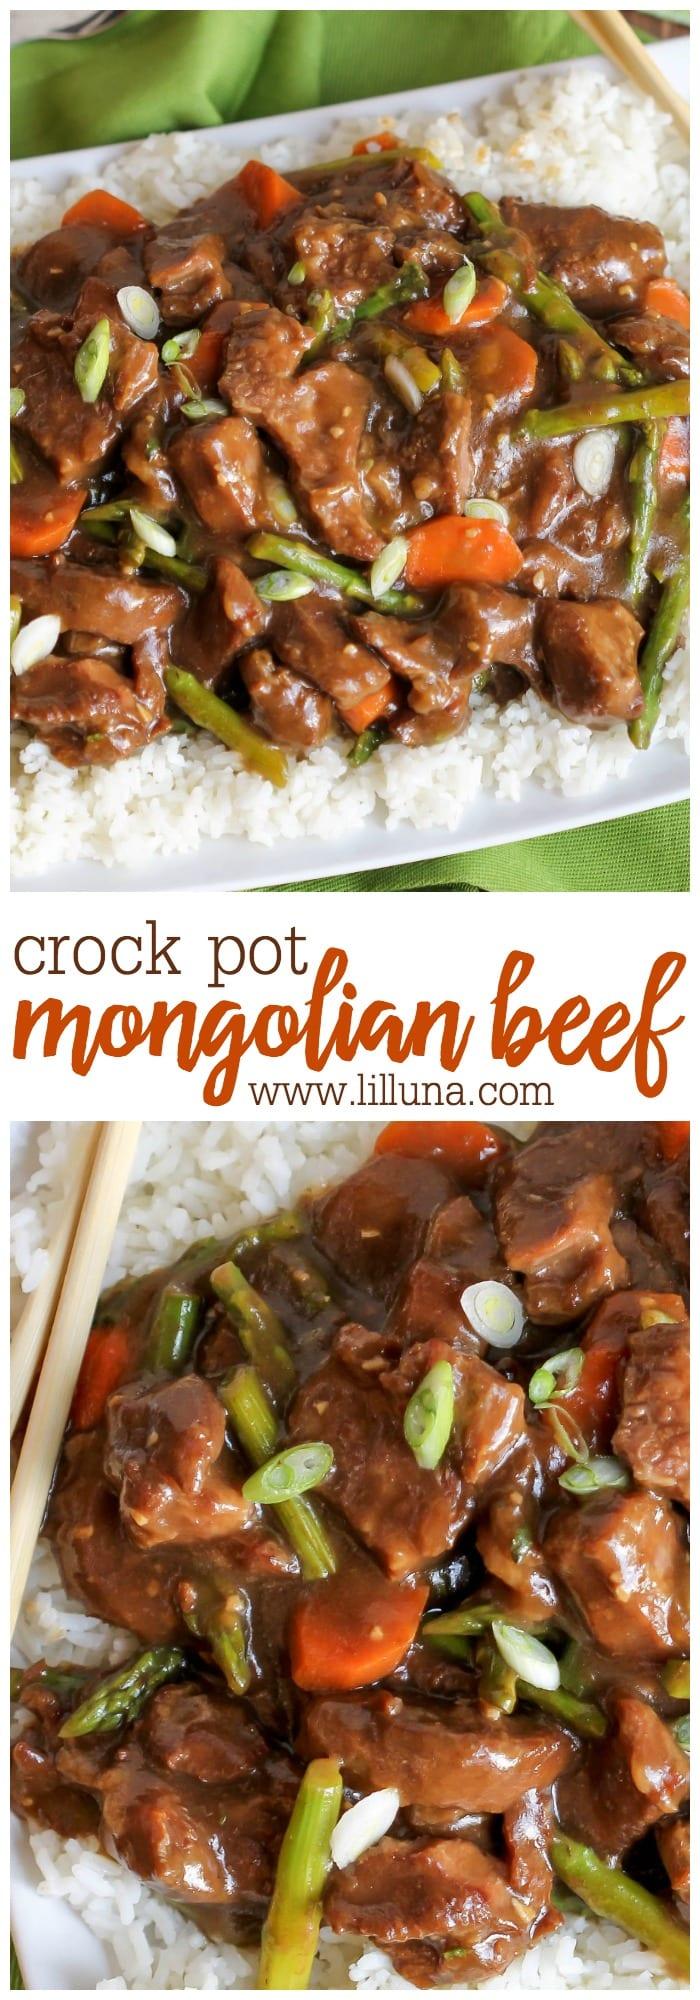 Best Crockpot Roast Beef Recipes